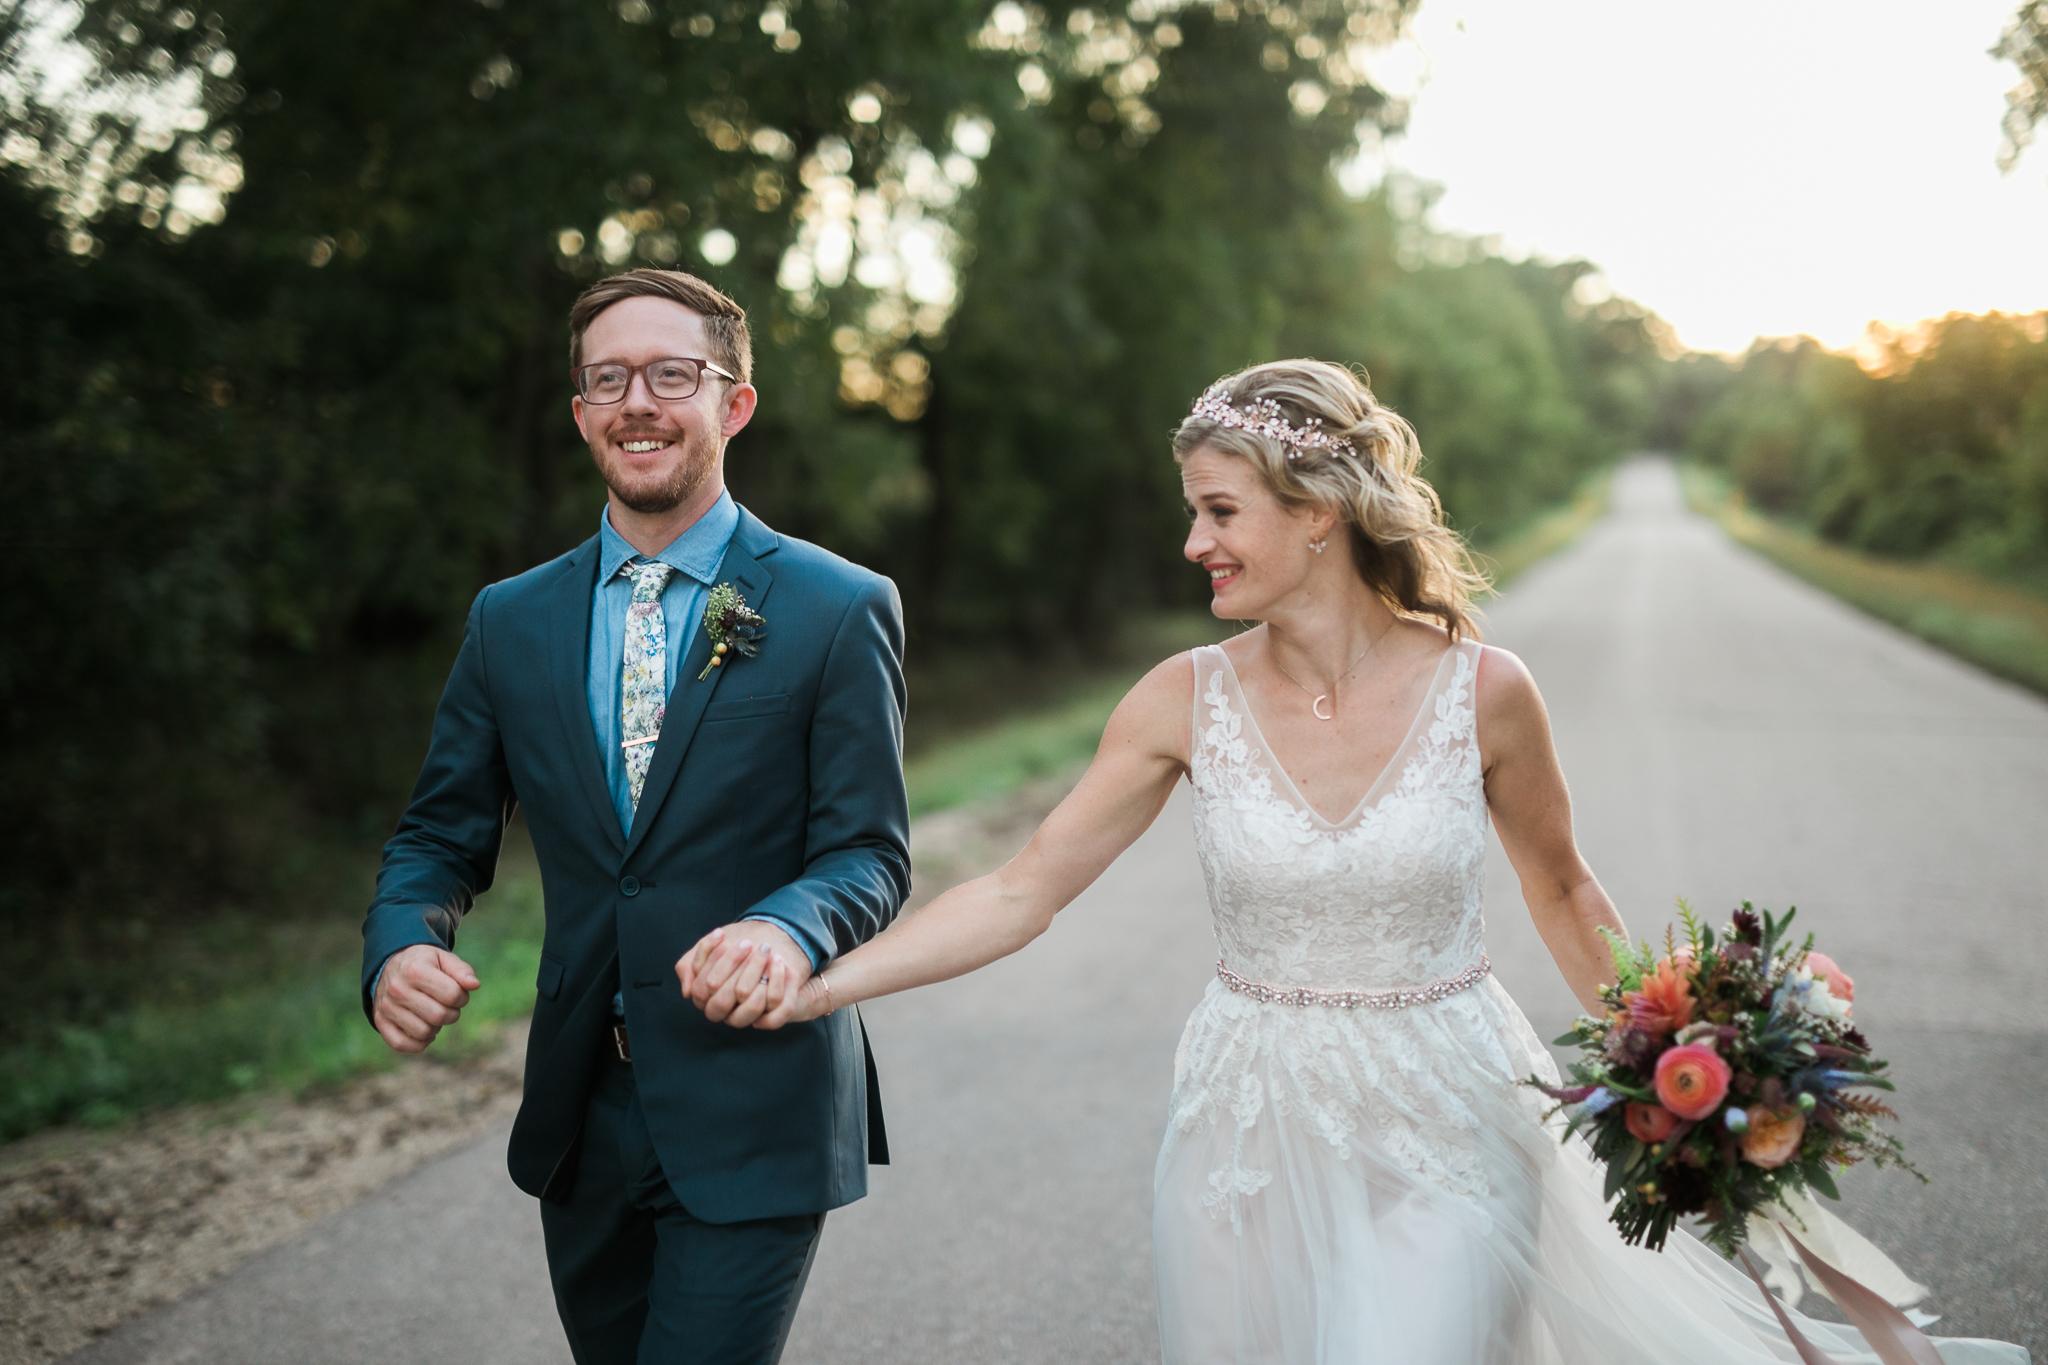 Paoli-Mill-wedding-summer-Wisconsin_183.jpg